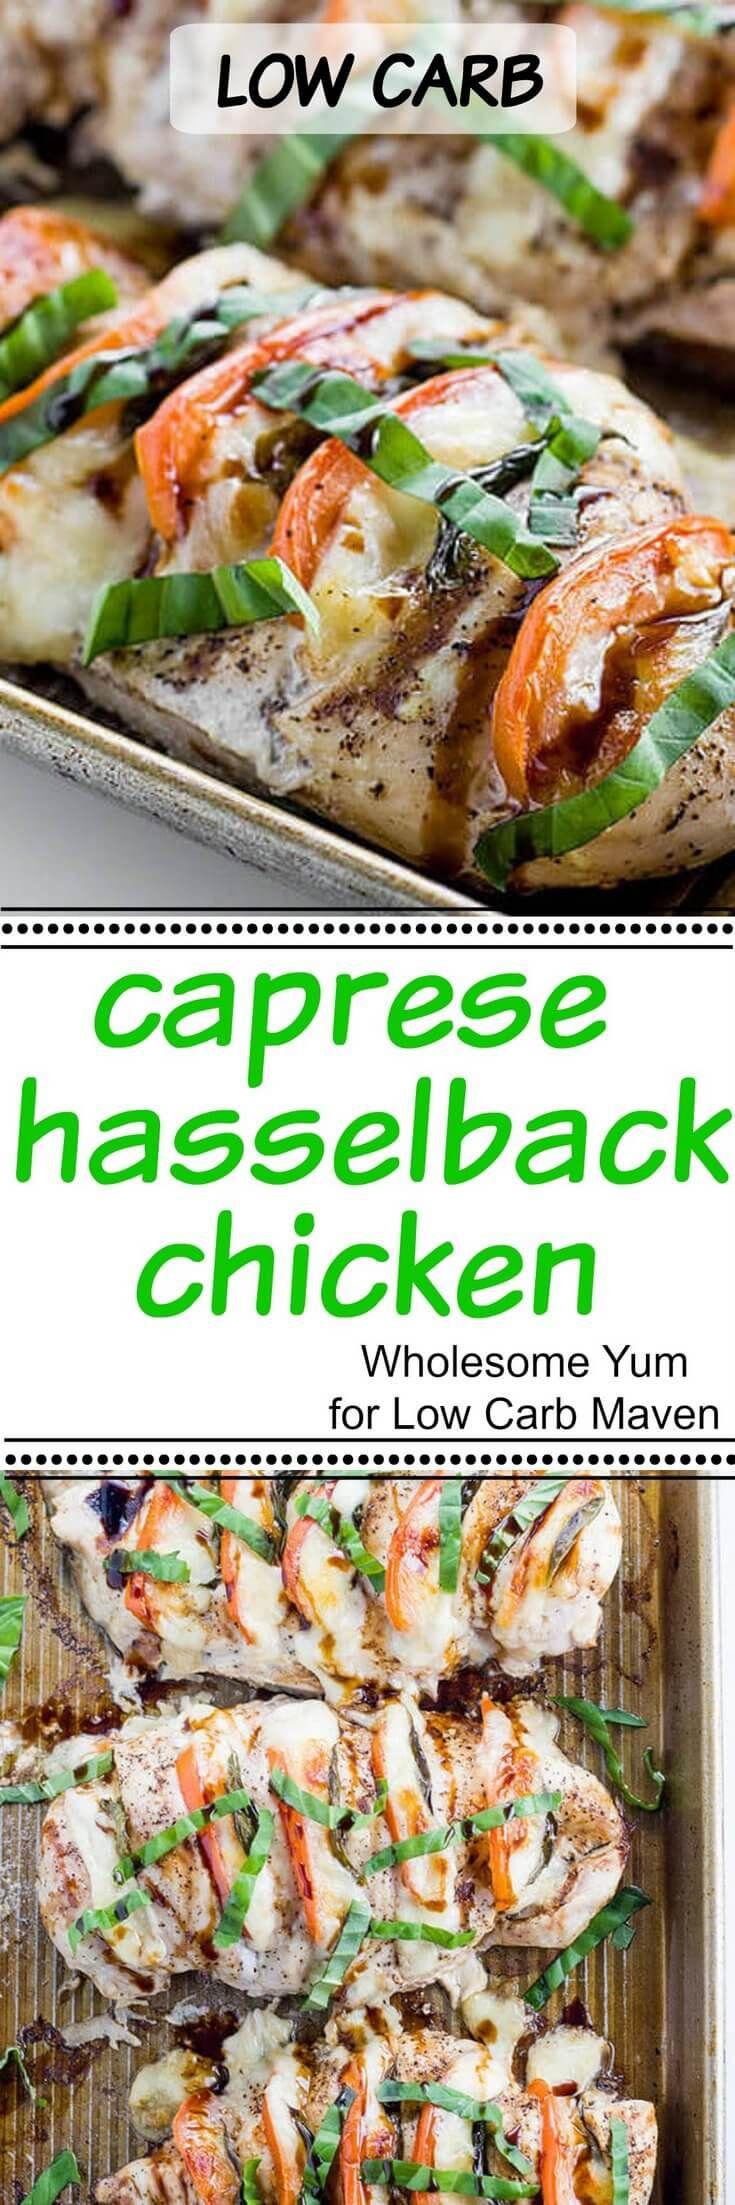 Caprese Hasselback Chicken